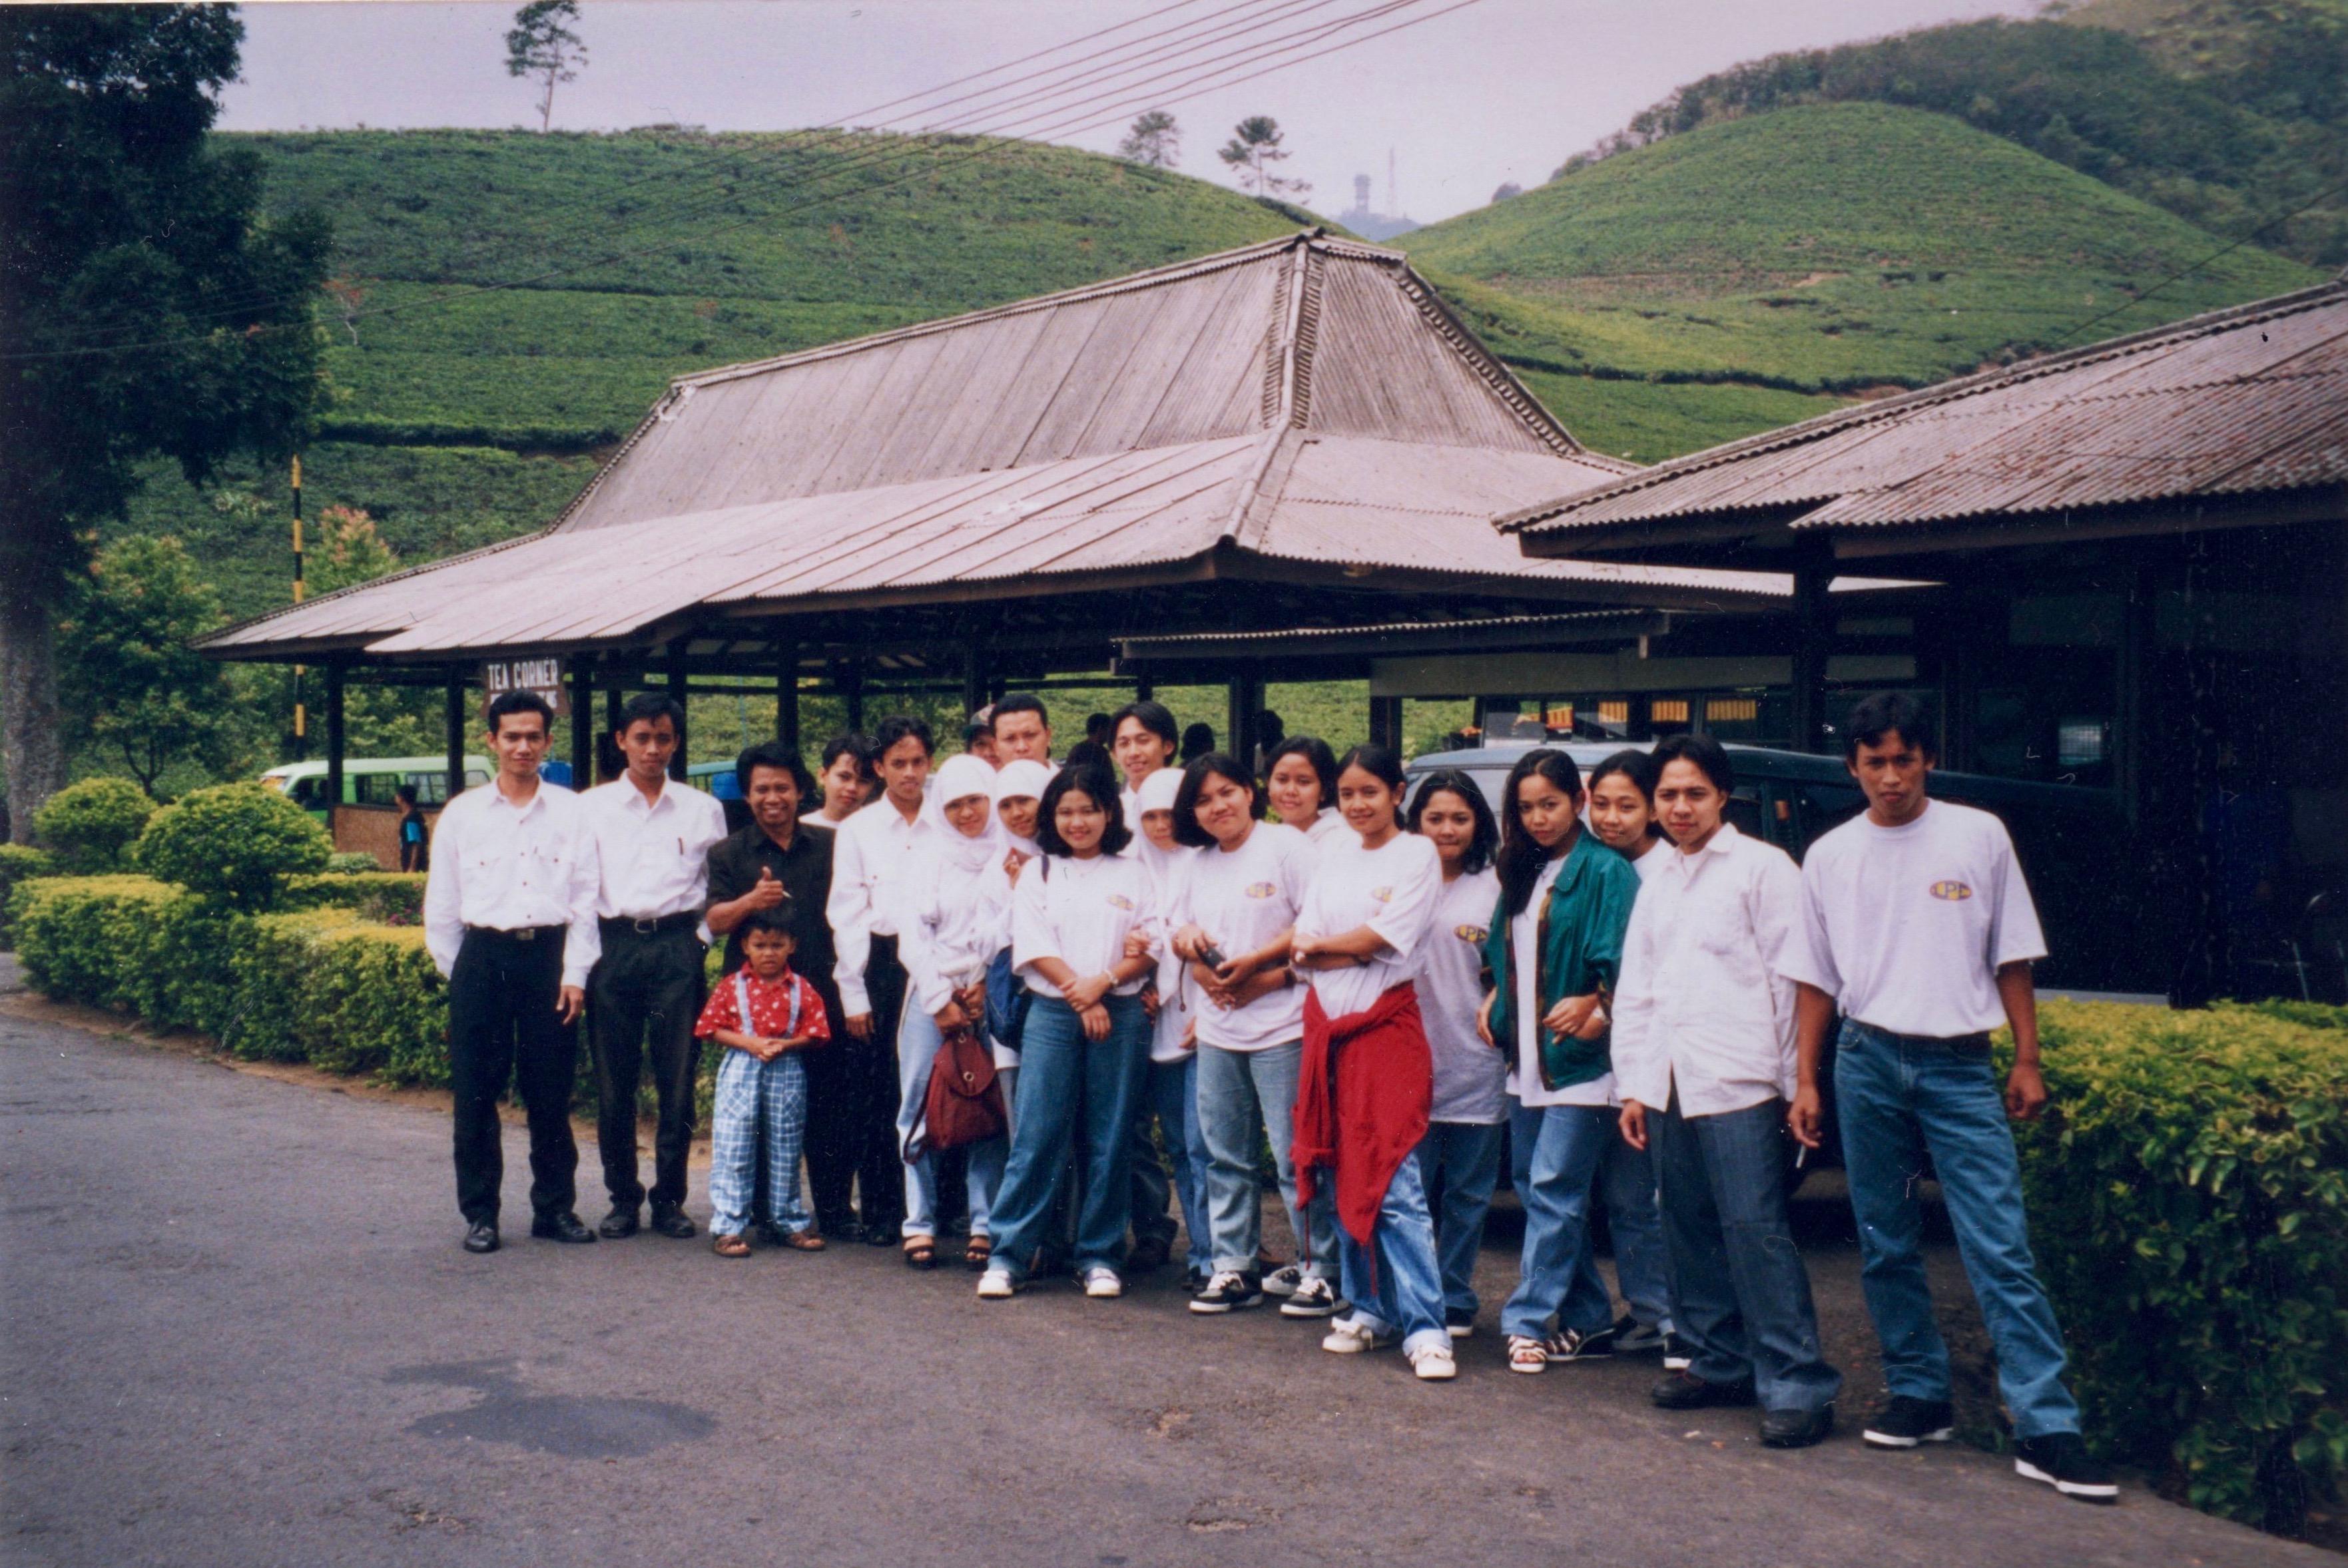 School Group, Guning Mas Tea Plantation, Java, Indonesia